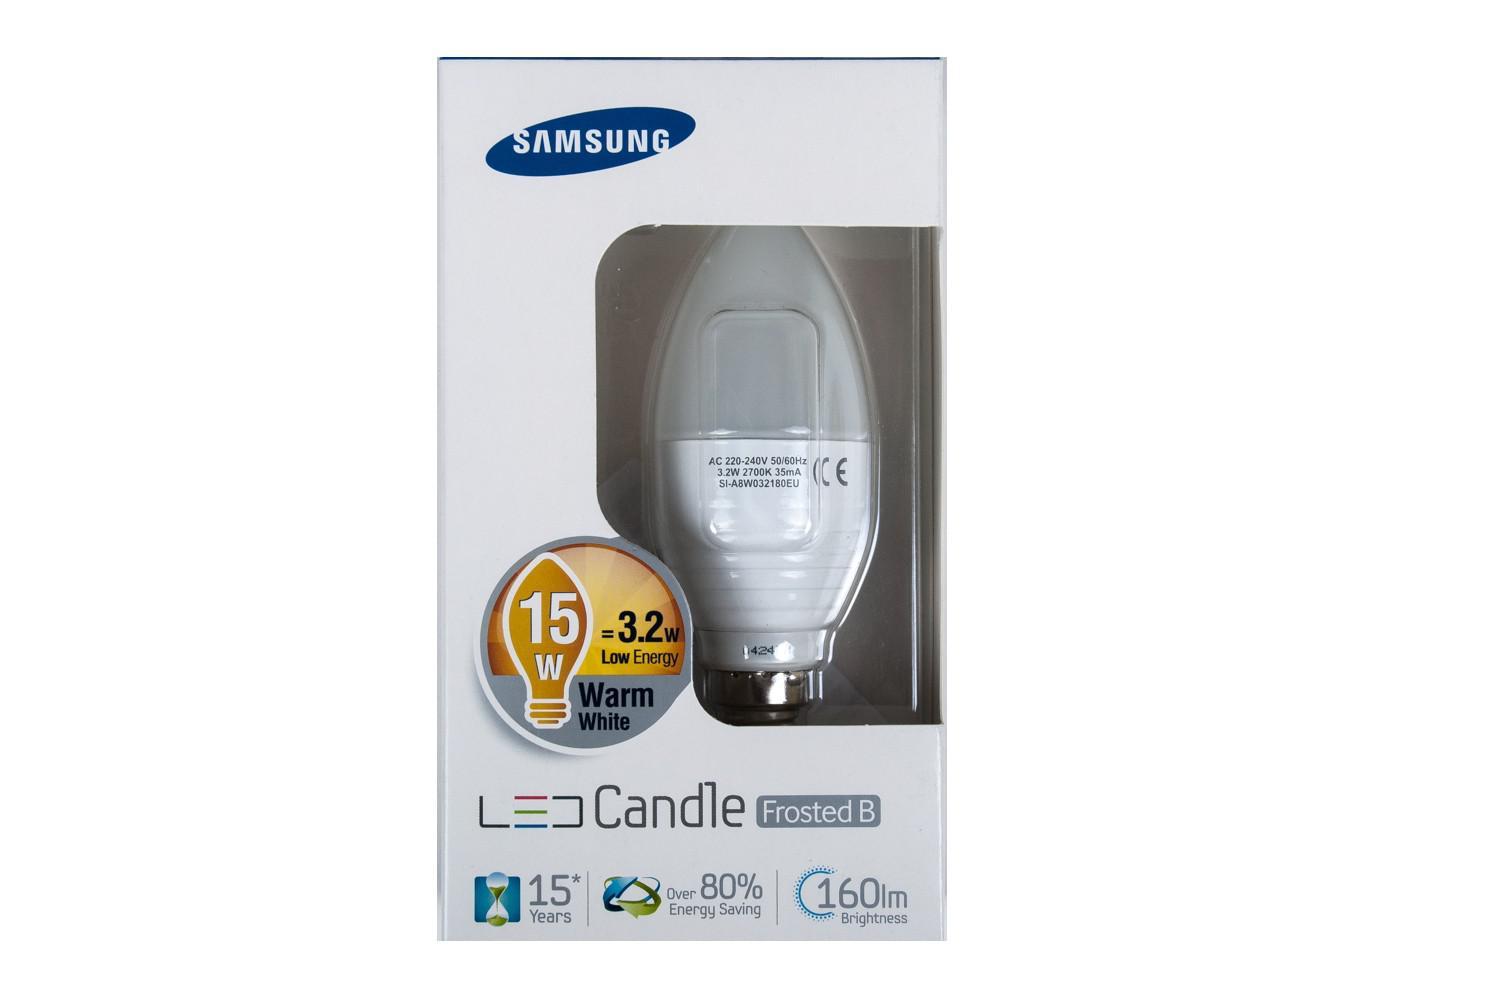 Samsung led lampen e14 energiesparlampe e27 leuchtmittel kerze samsung led lampen e14 energiesparlampe e27 leuchtmittel kerze strahler warmwei 4 parisarafo Choice Image